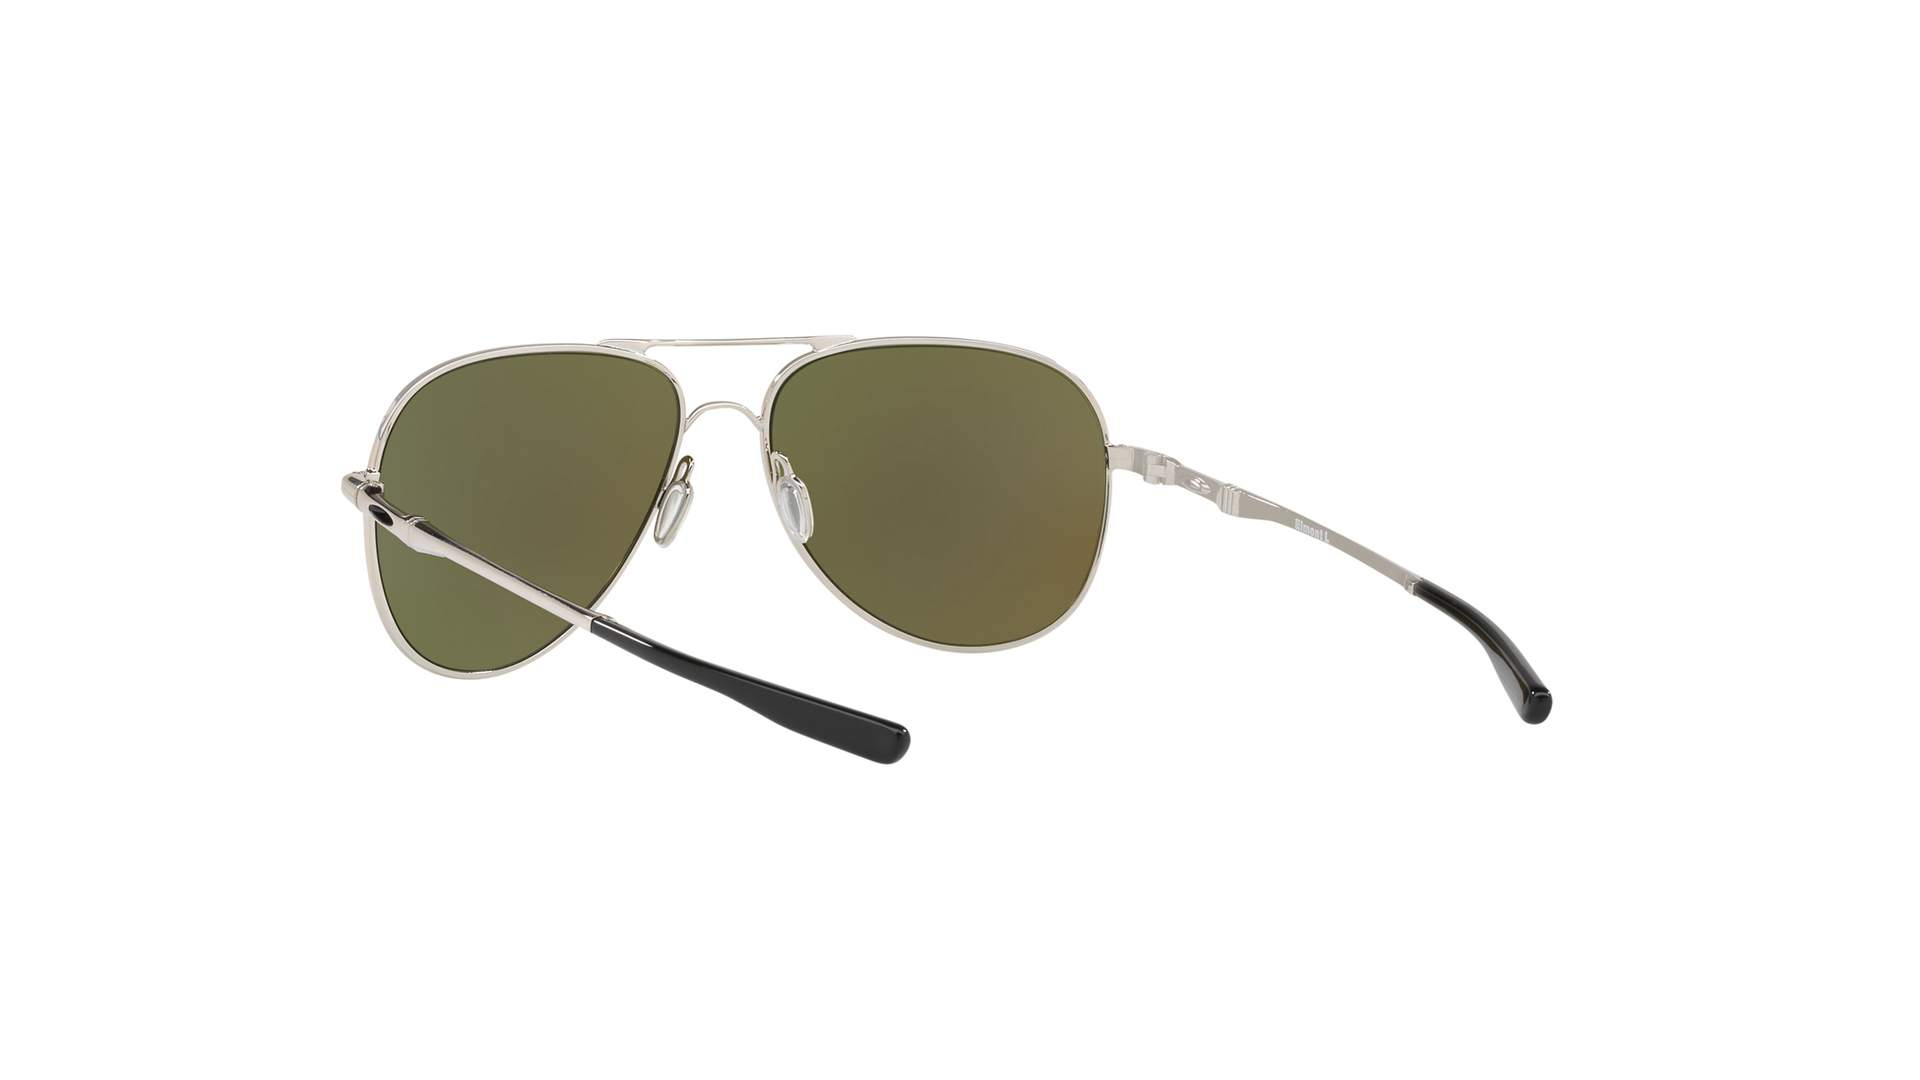 223ee51d84 Sunglasses Oakley Elmont m Silver Prizm OO4119 10 58-15 Medium Mirror